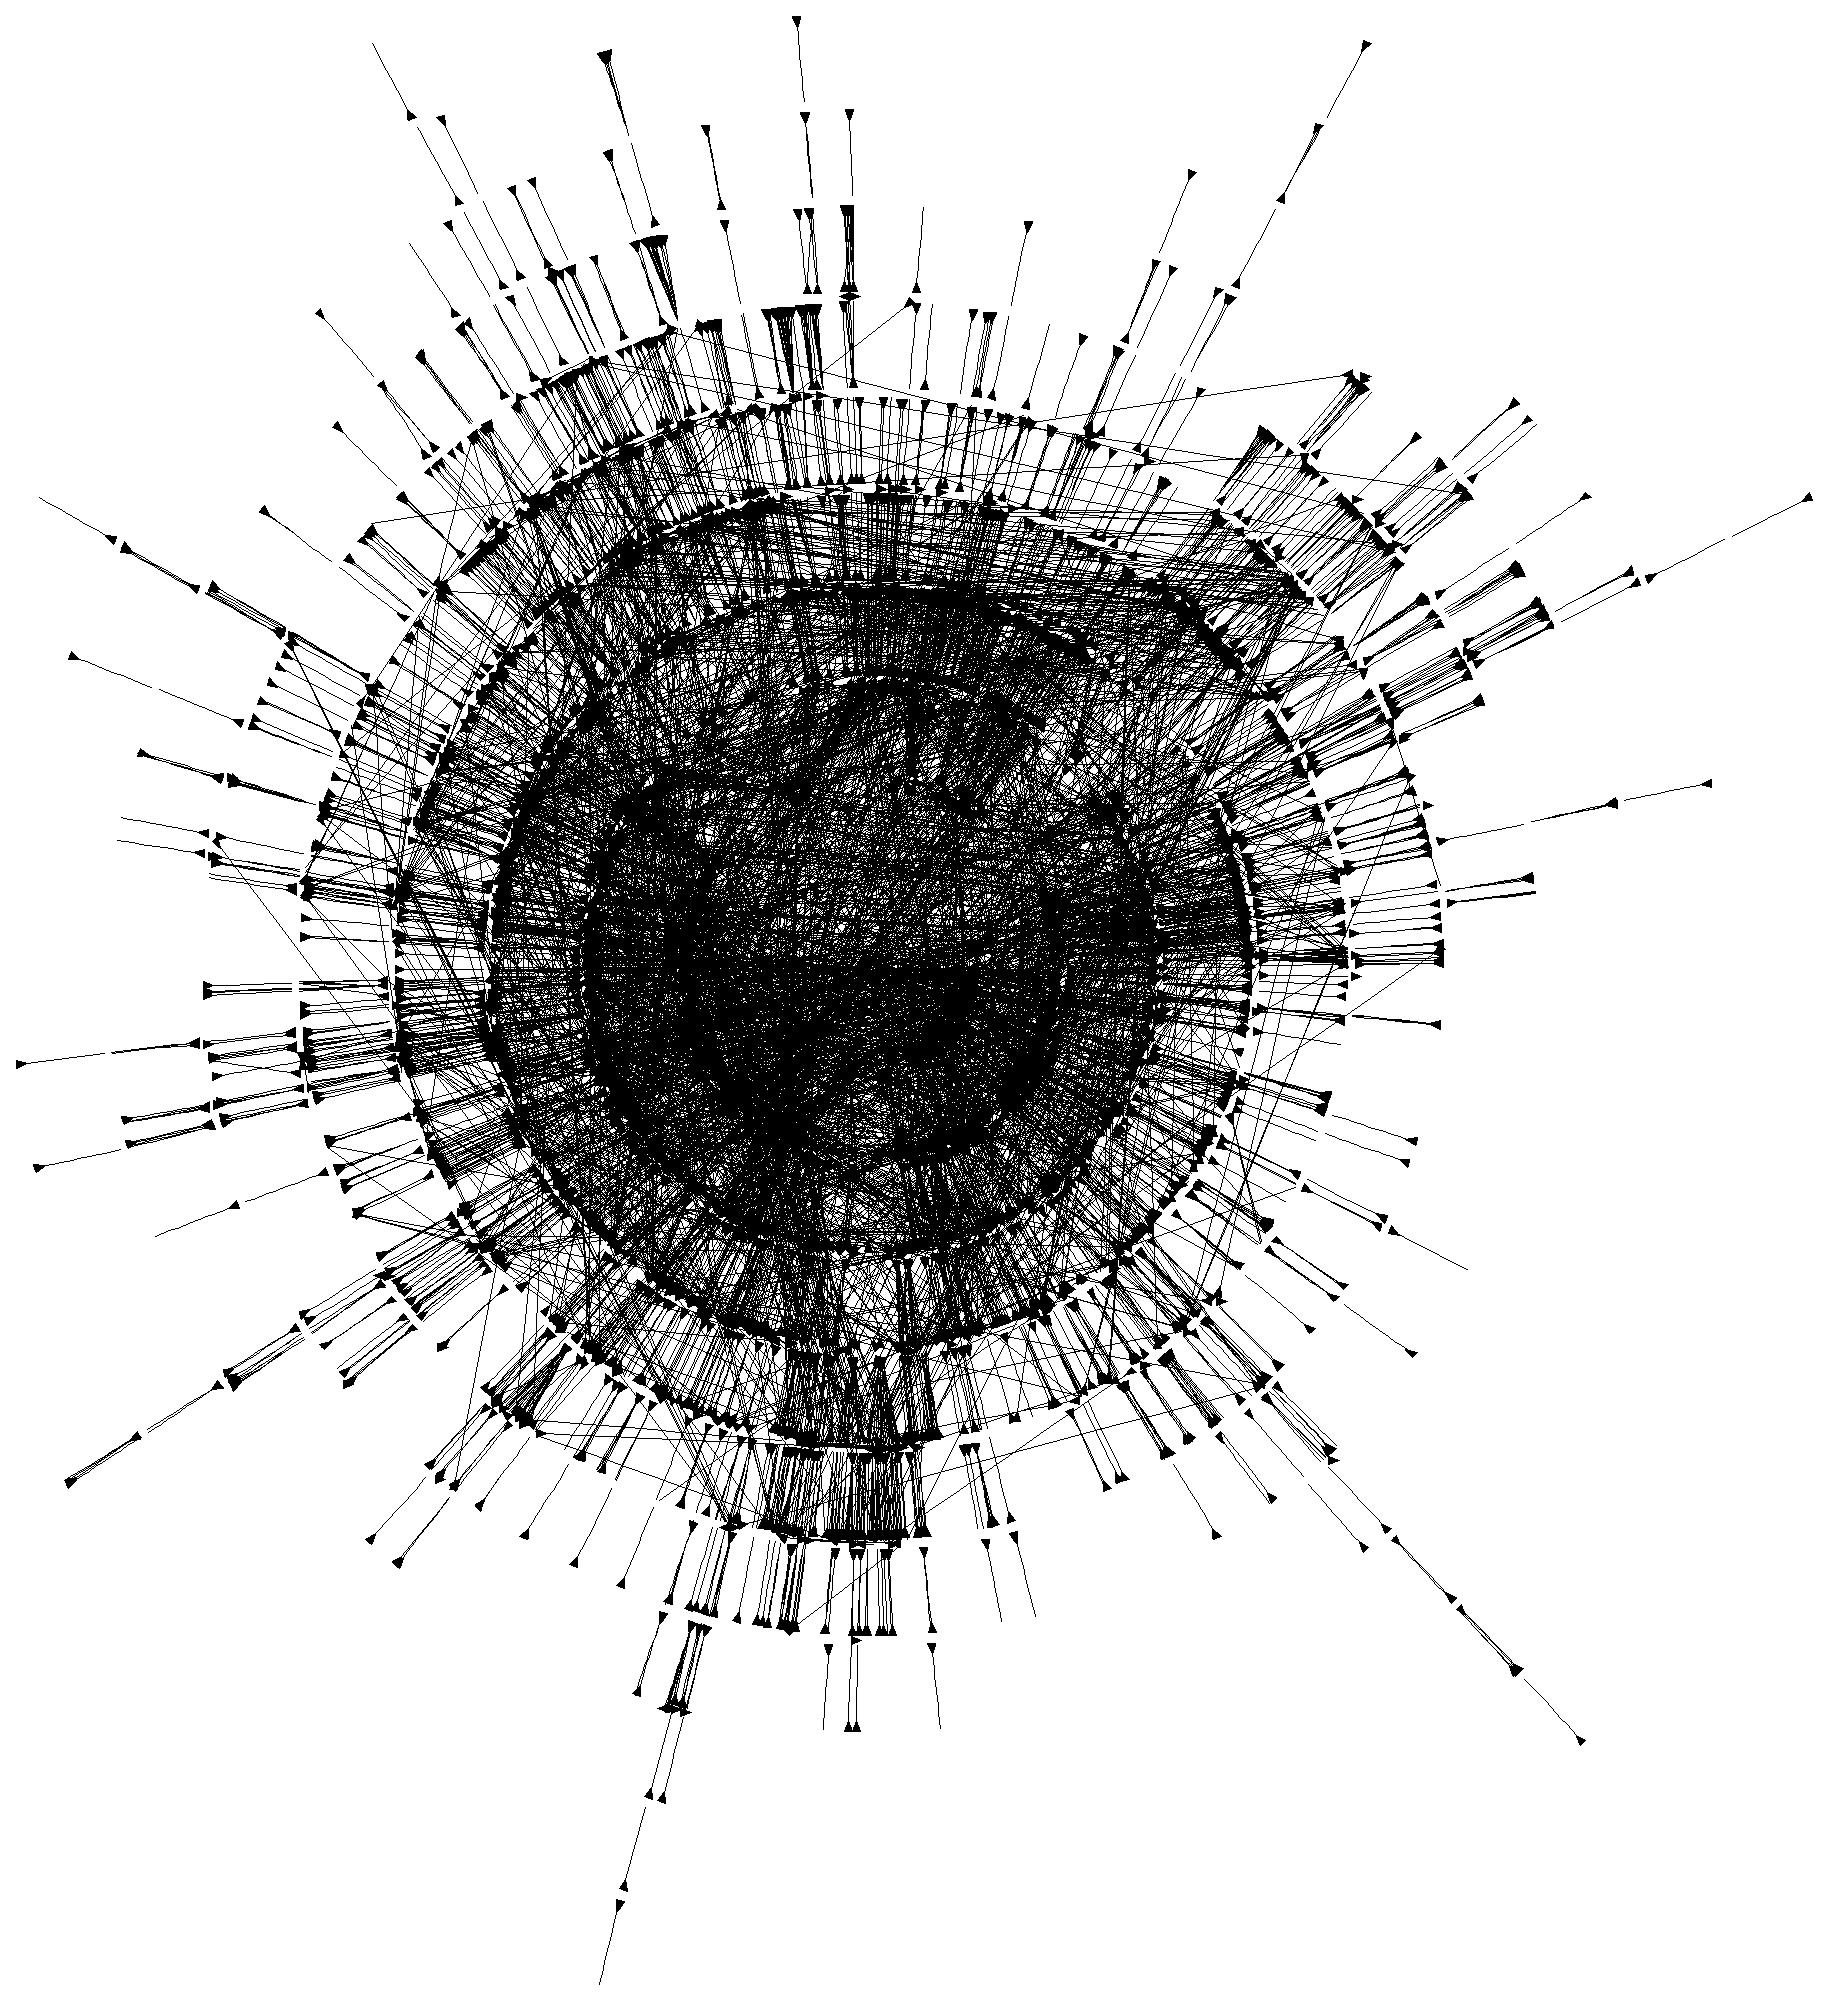 Pin By Matt Heinzler On Form Language In